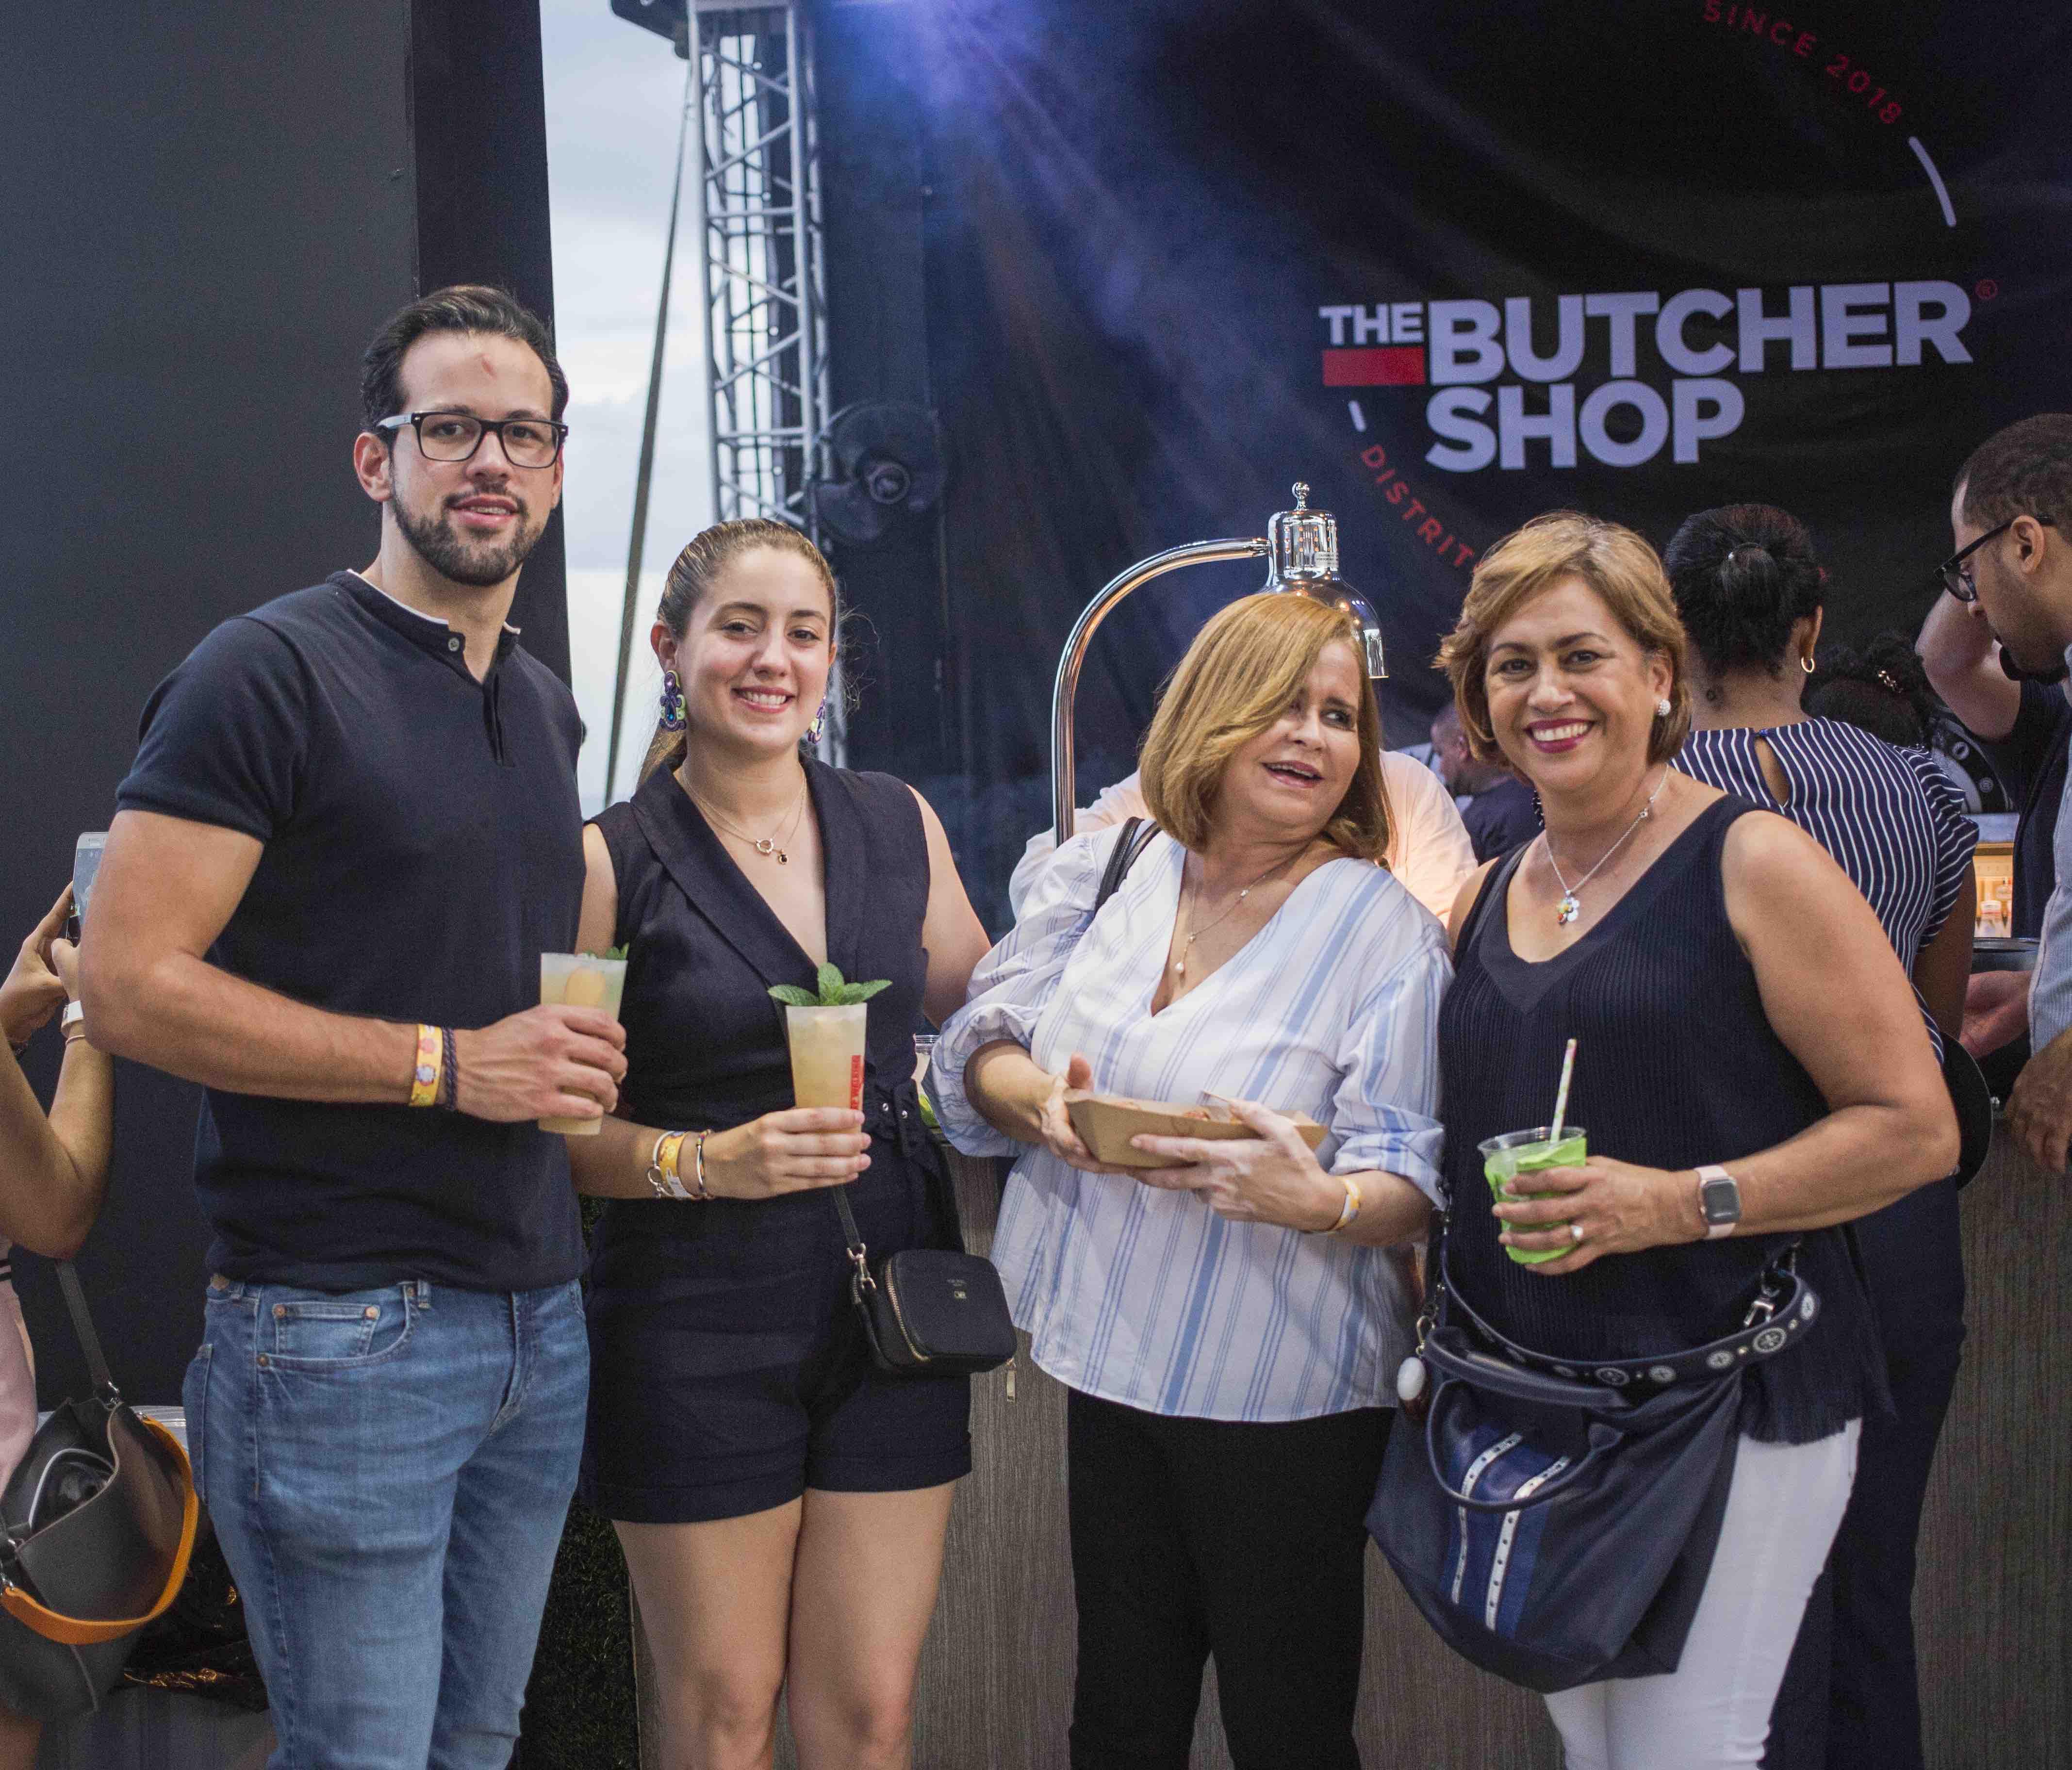 10. Jose Sella, Clementine Mangeri, Fior Frias y Yolanda Mangeri